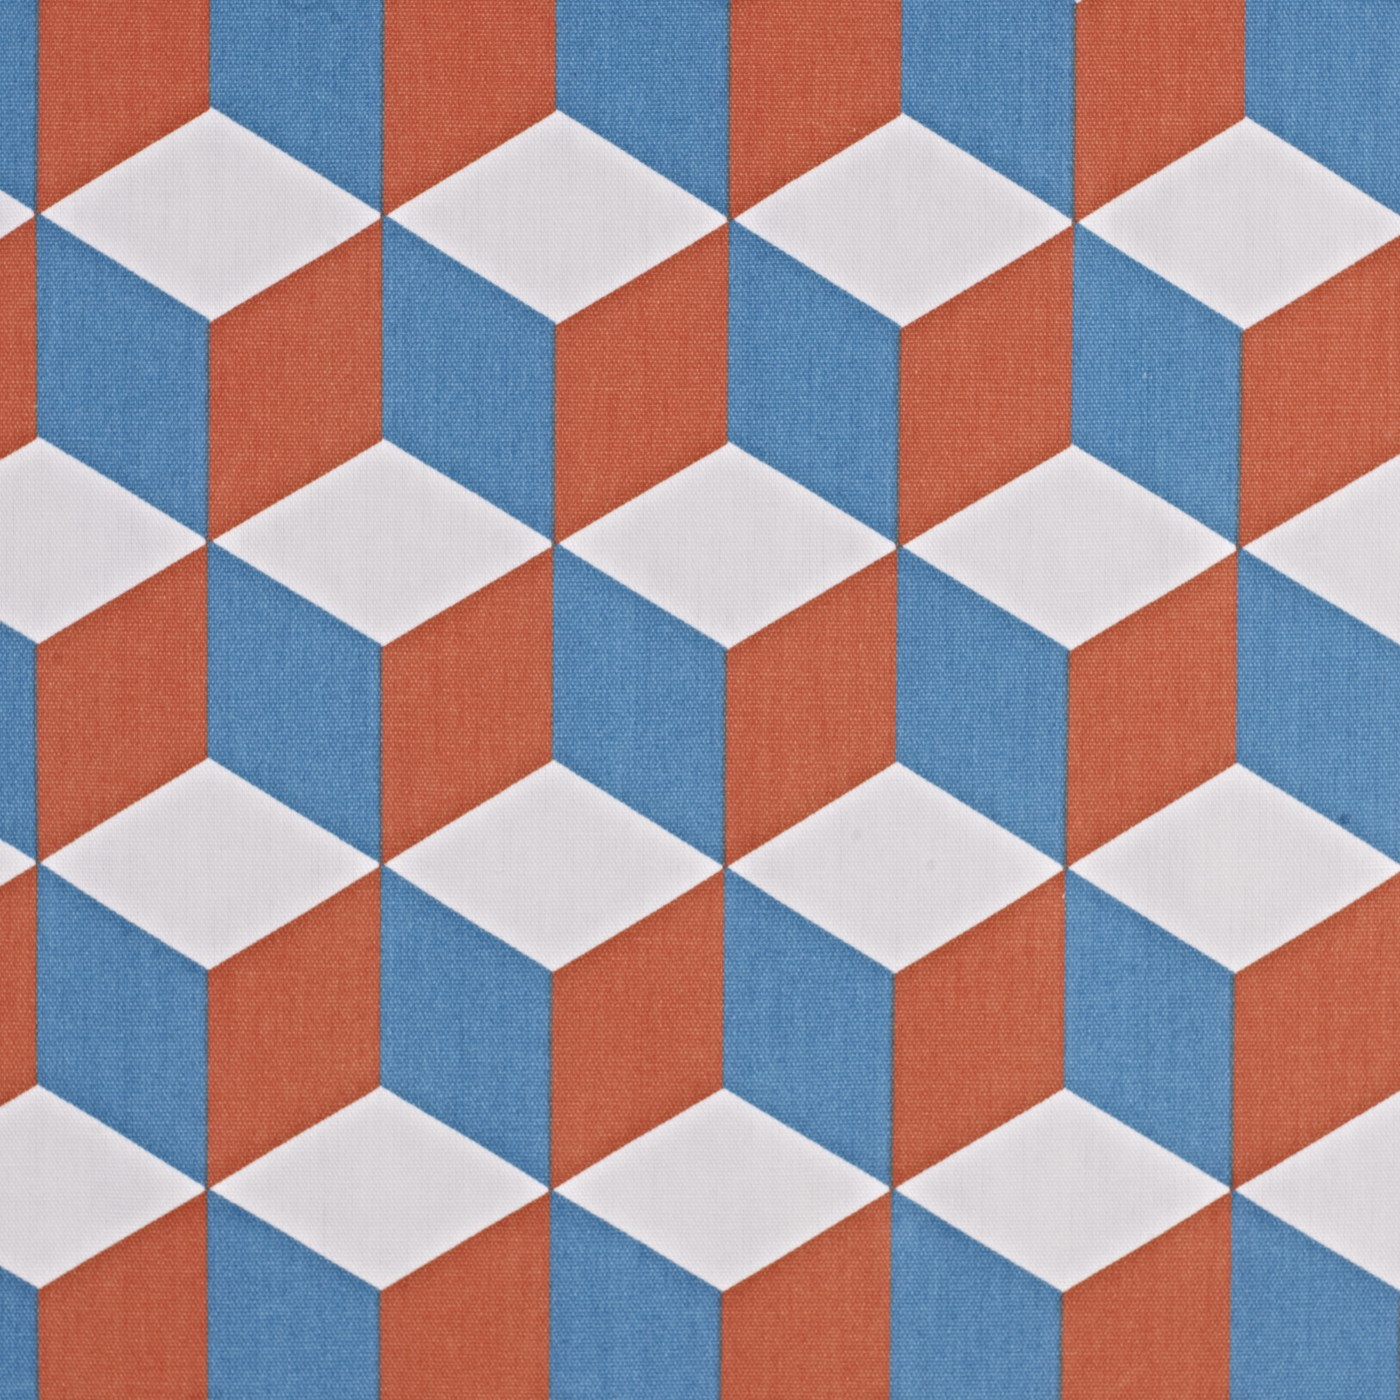 Cube Tangerine